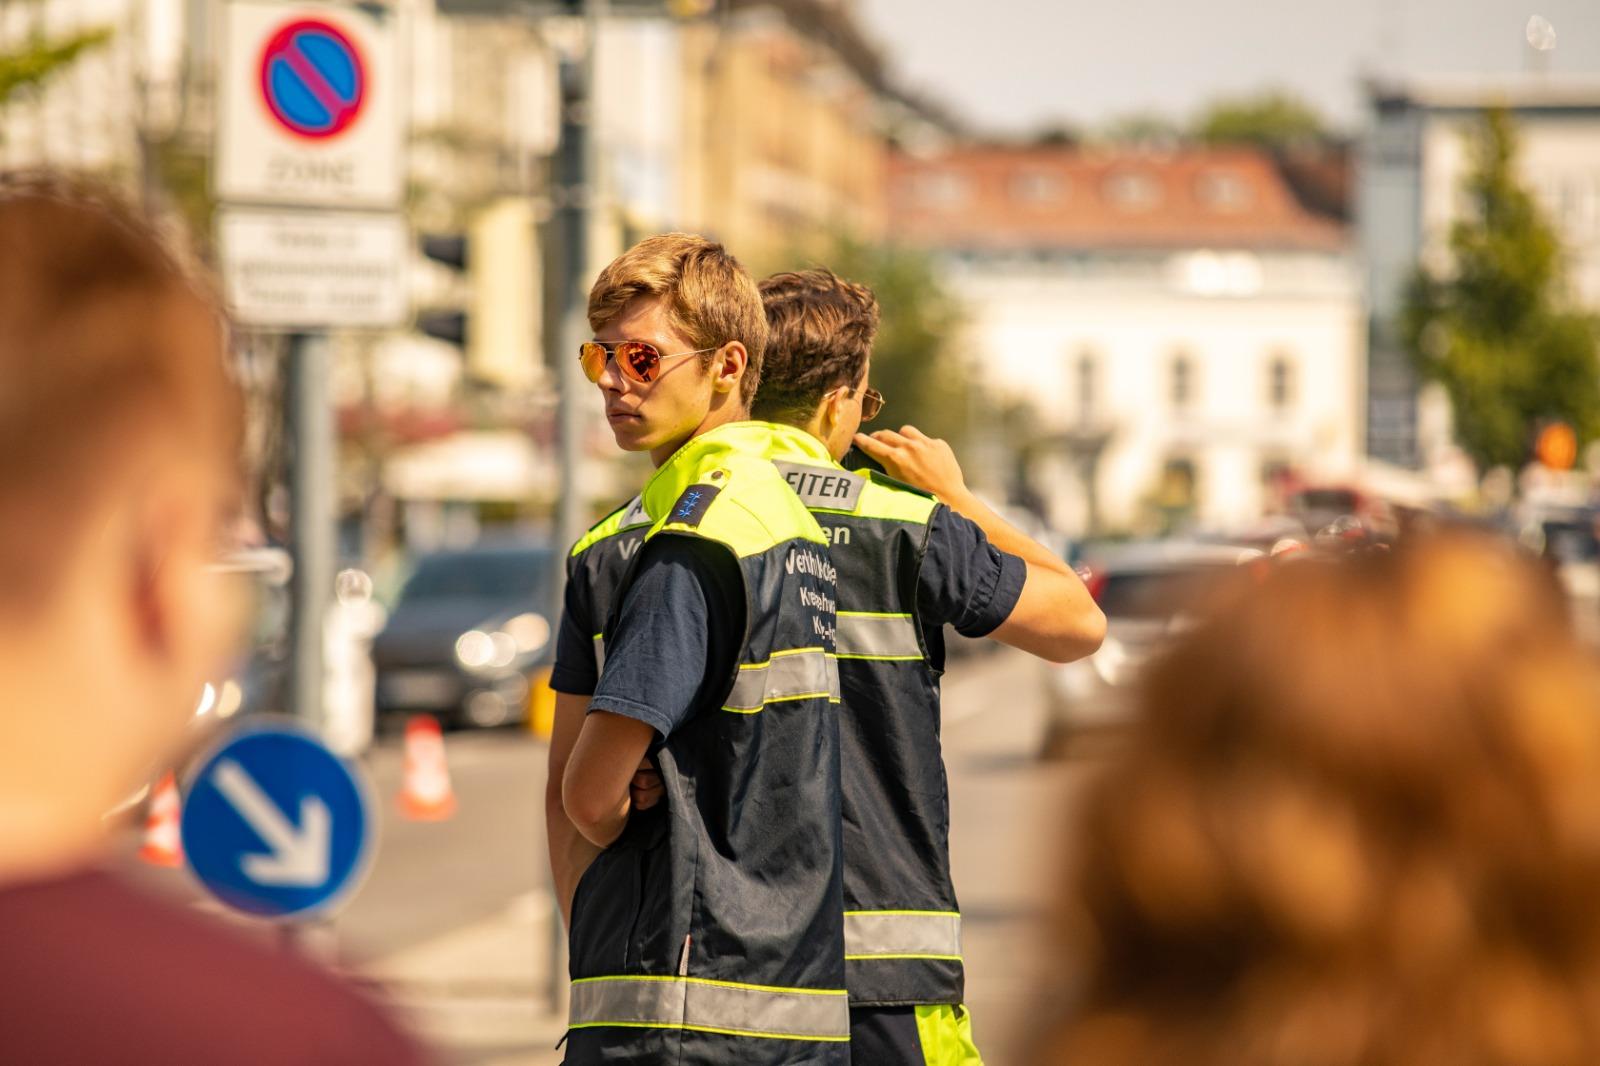 Verkehrskadetteneinsatz-in-der-Altstadt